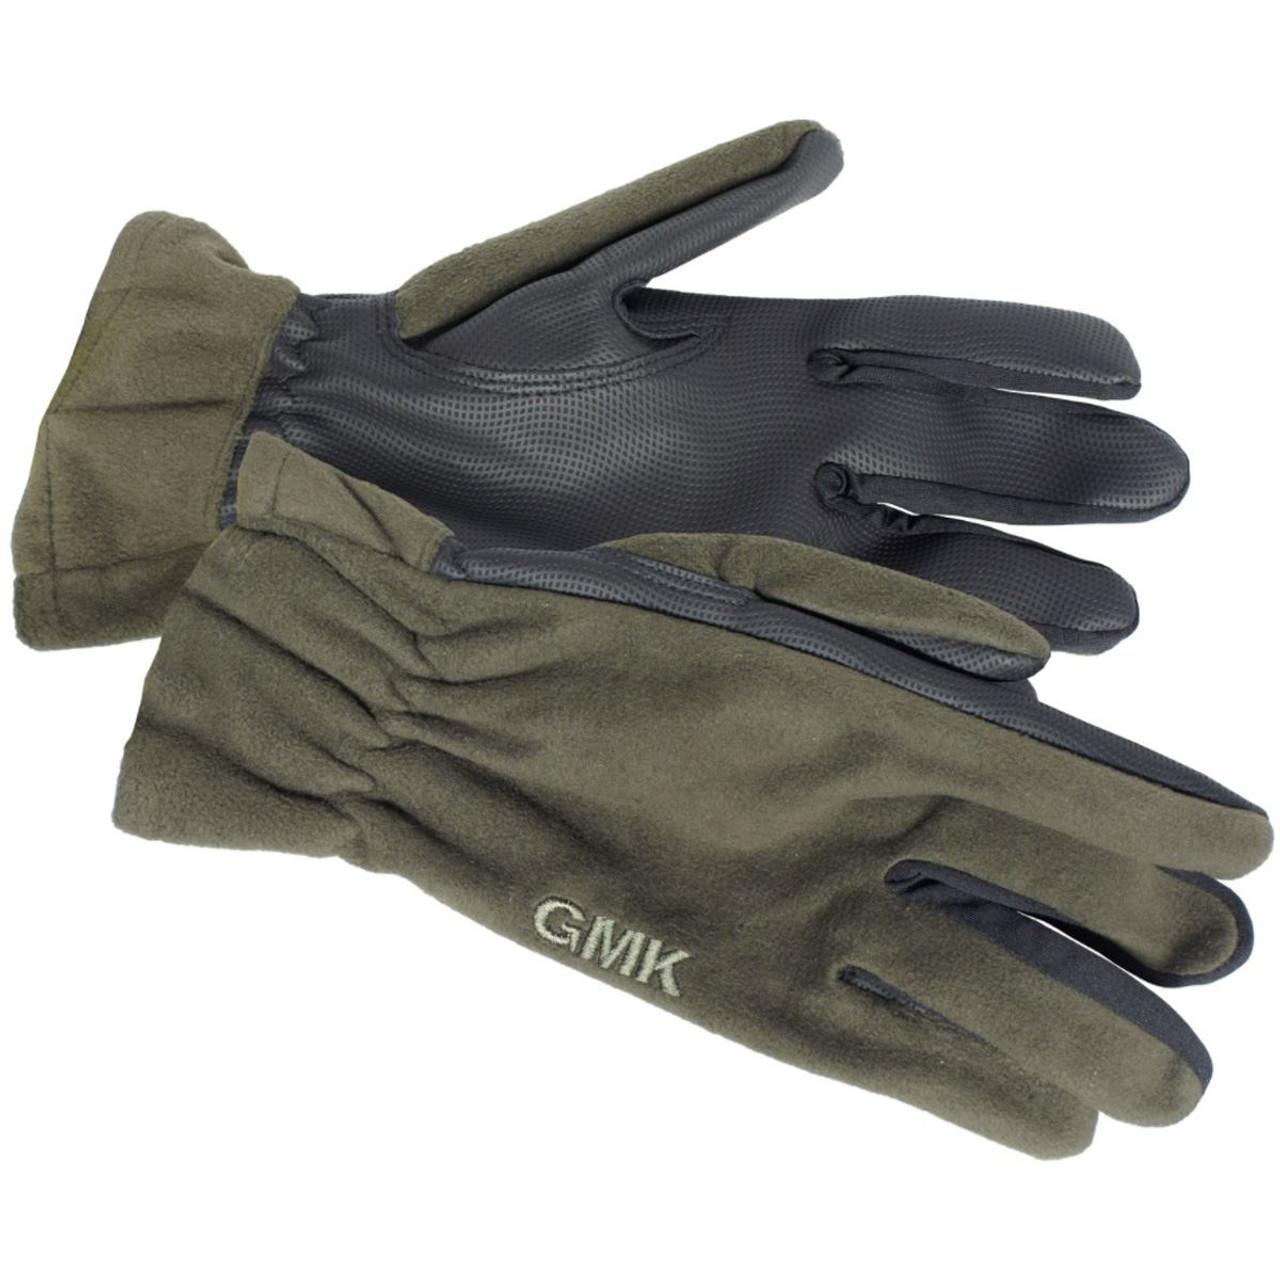 GMK Alton Windproof Gloves